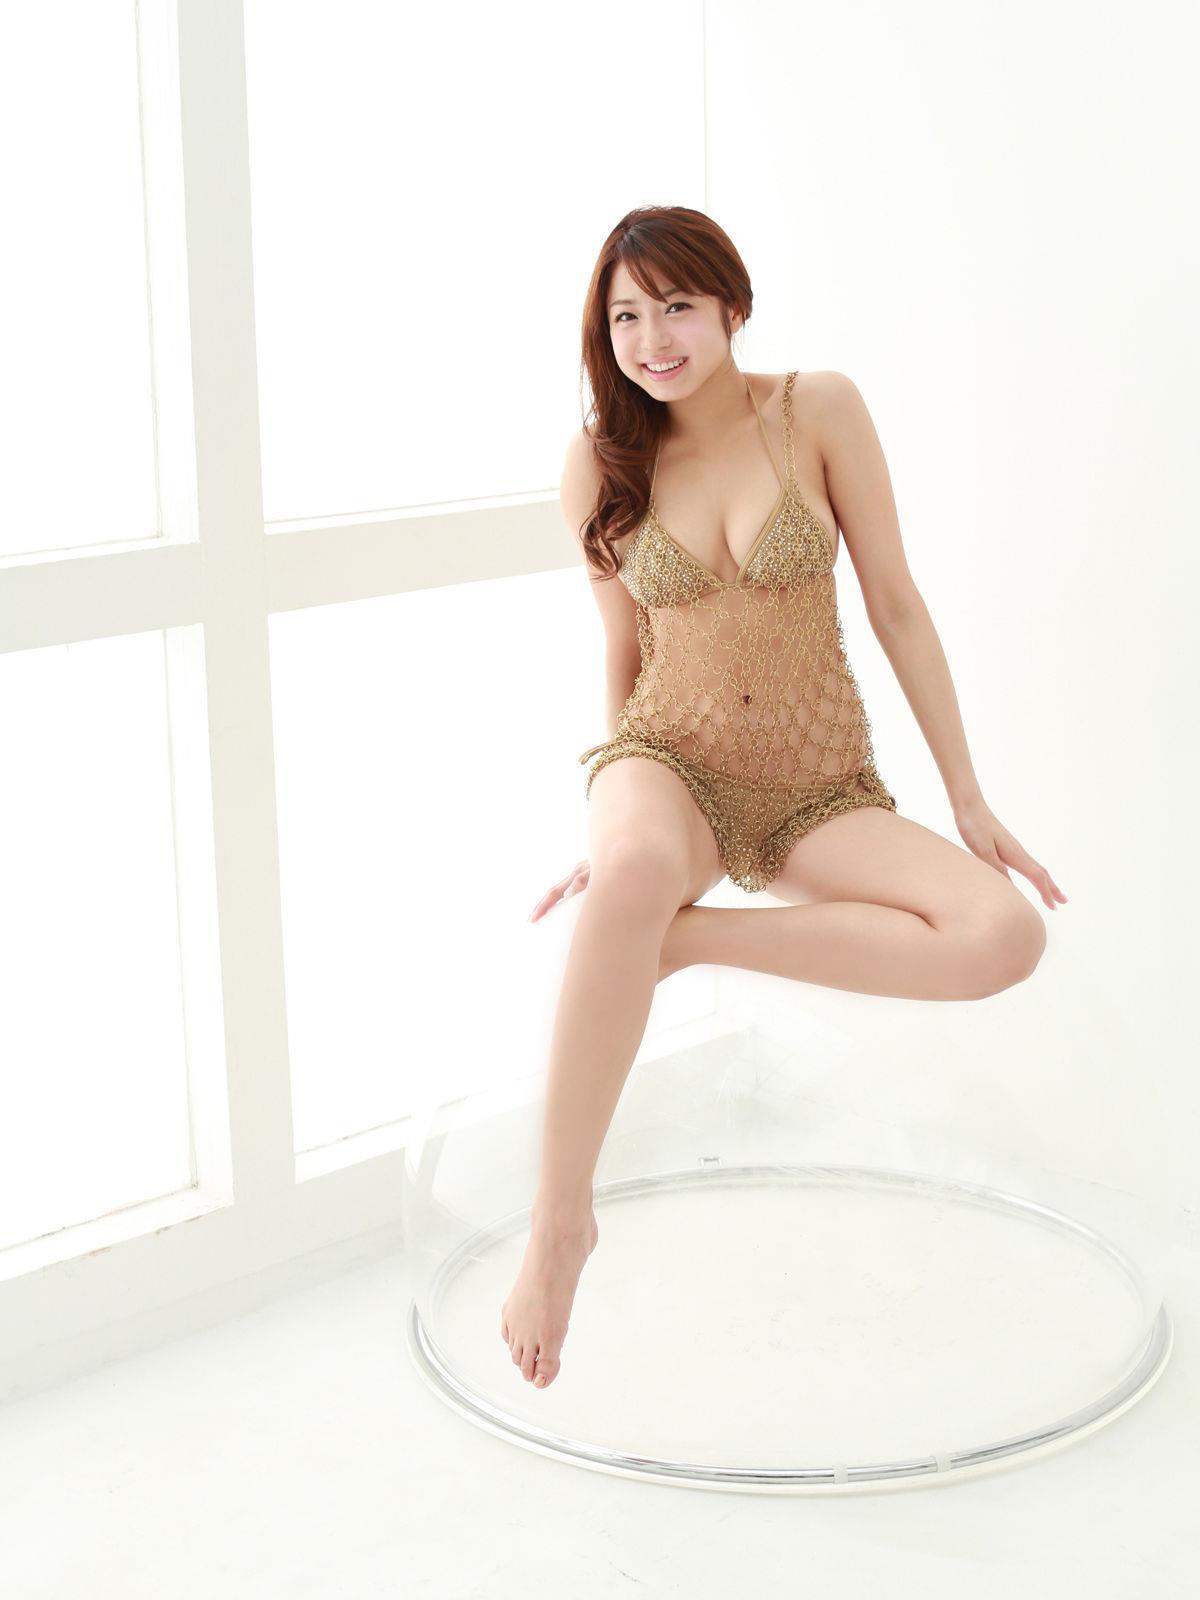 中村静香 画像 85